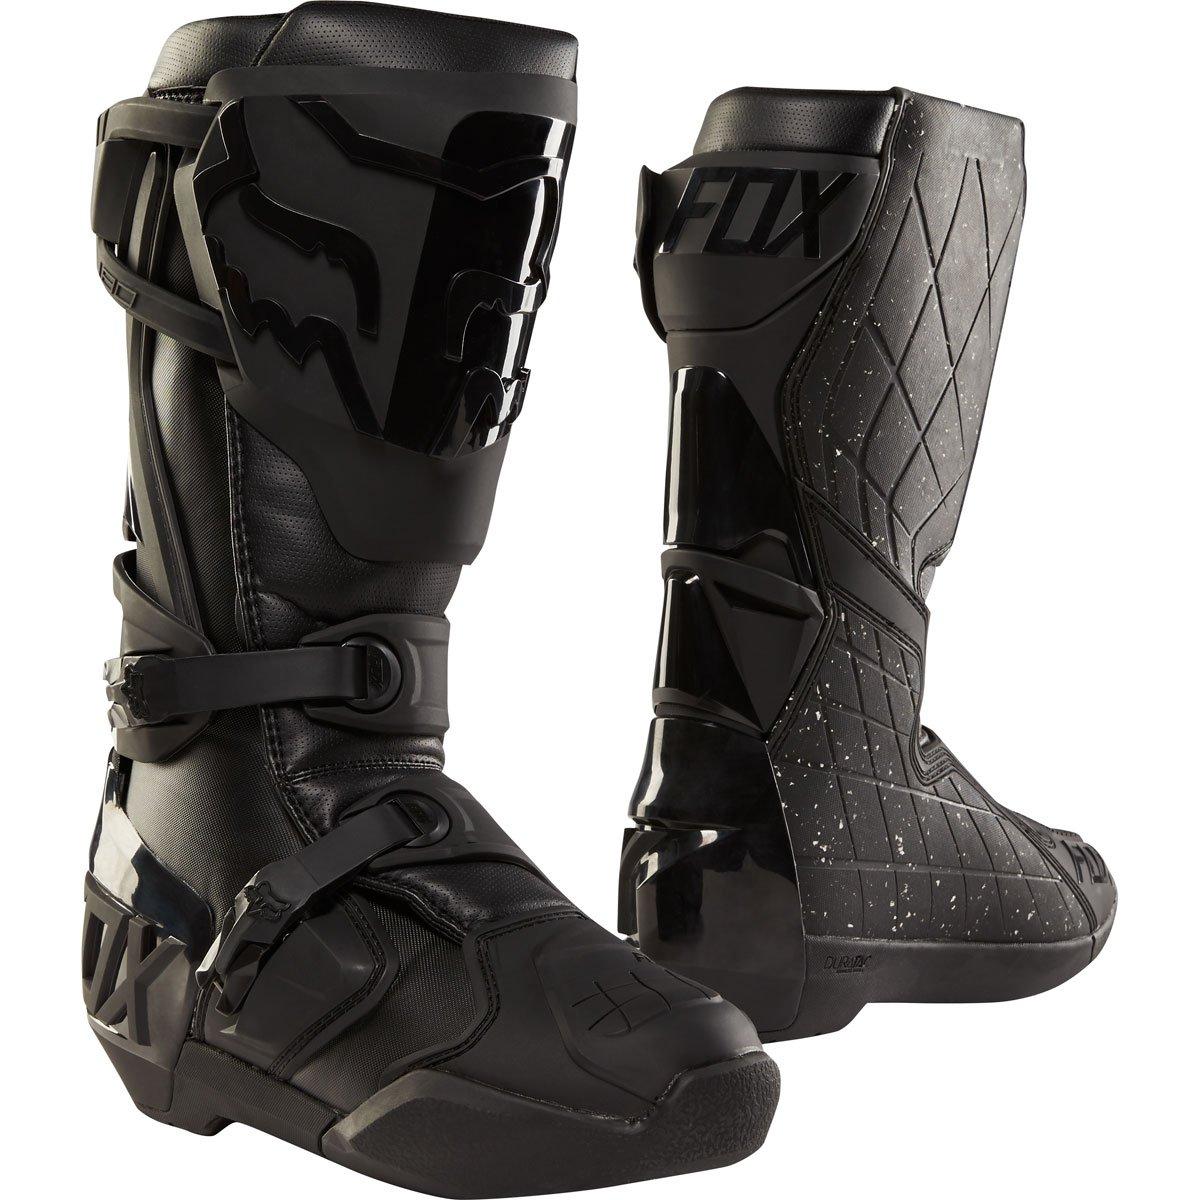 Fox Racing 180 Men's Off-Road Motorcycle Boots - Black/Black / 9